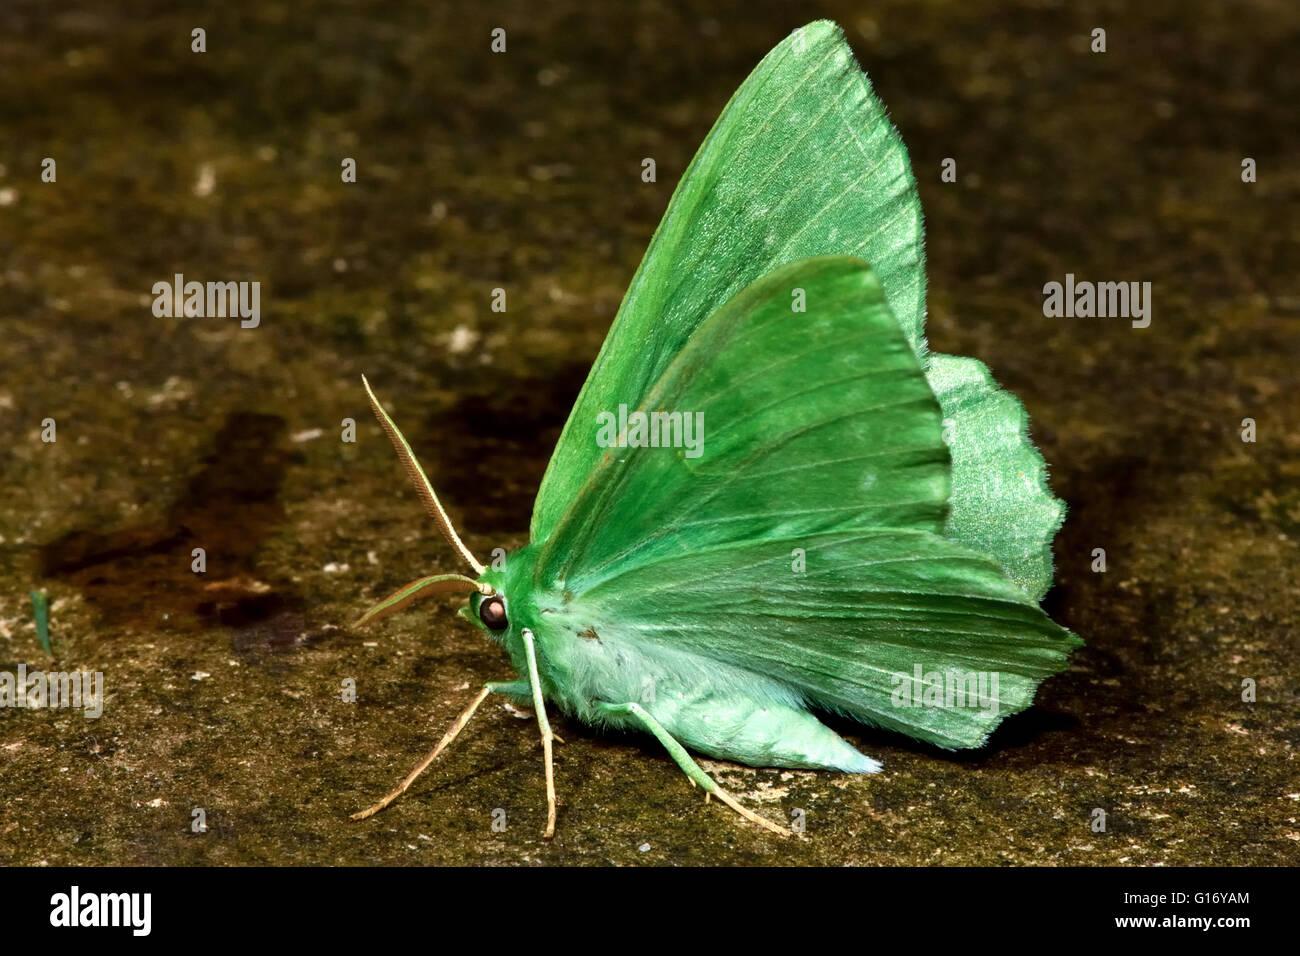 Großer Smaragd Motte (Geometra Papilionaria). Britische Insekt in der Familie Geometridae, Geometer Motten Stockbild